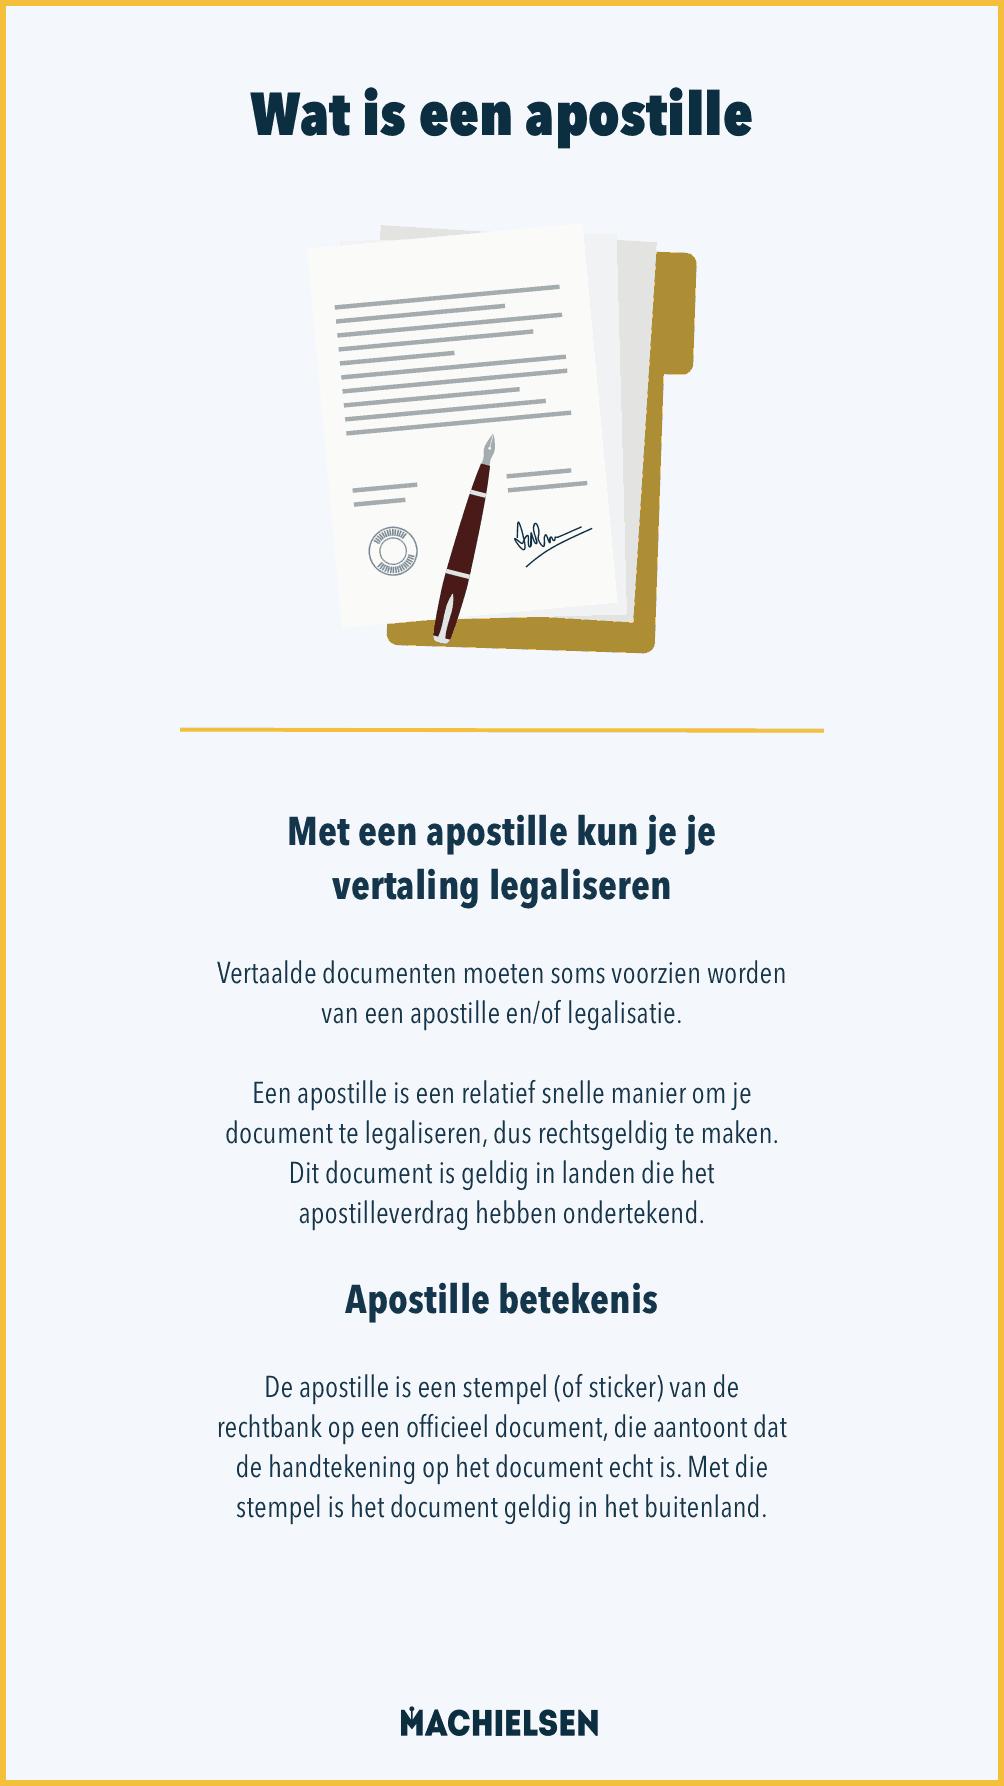 Apostille infographic